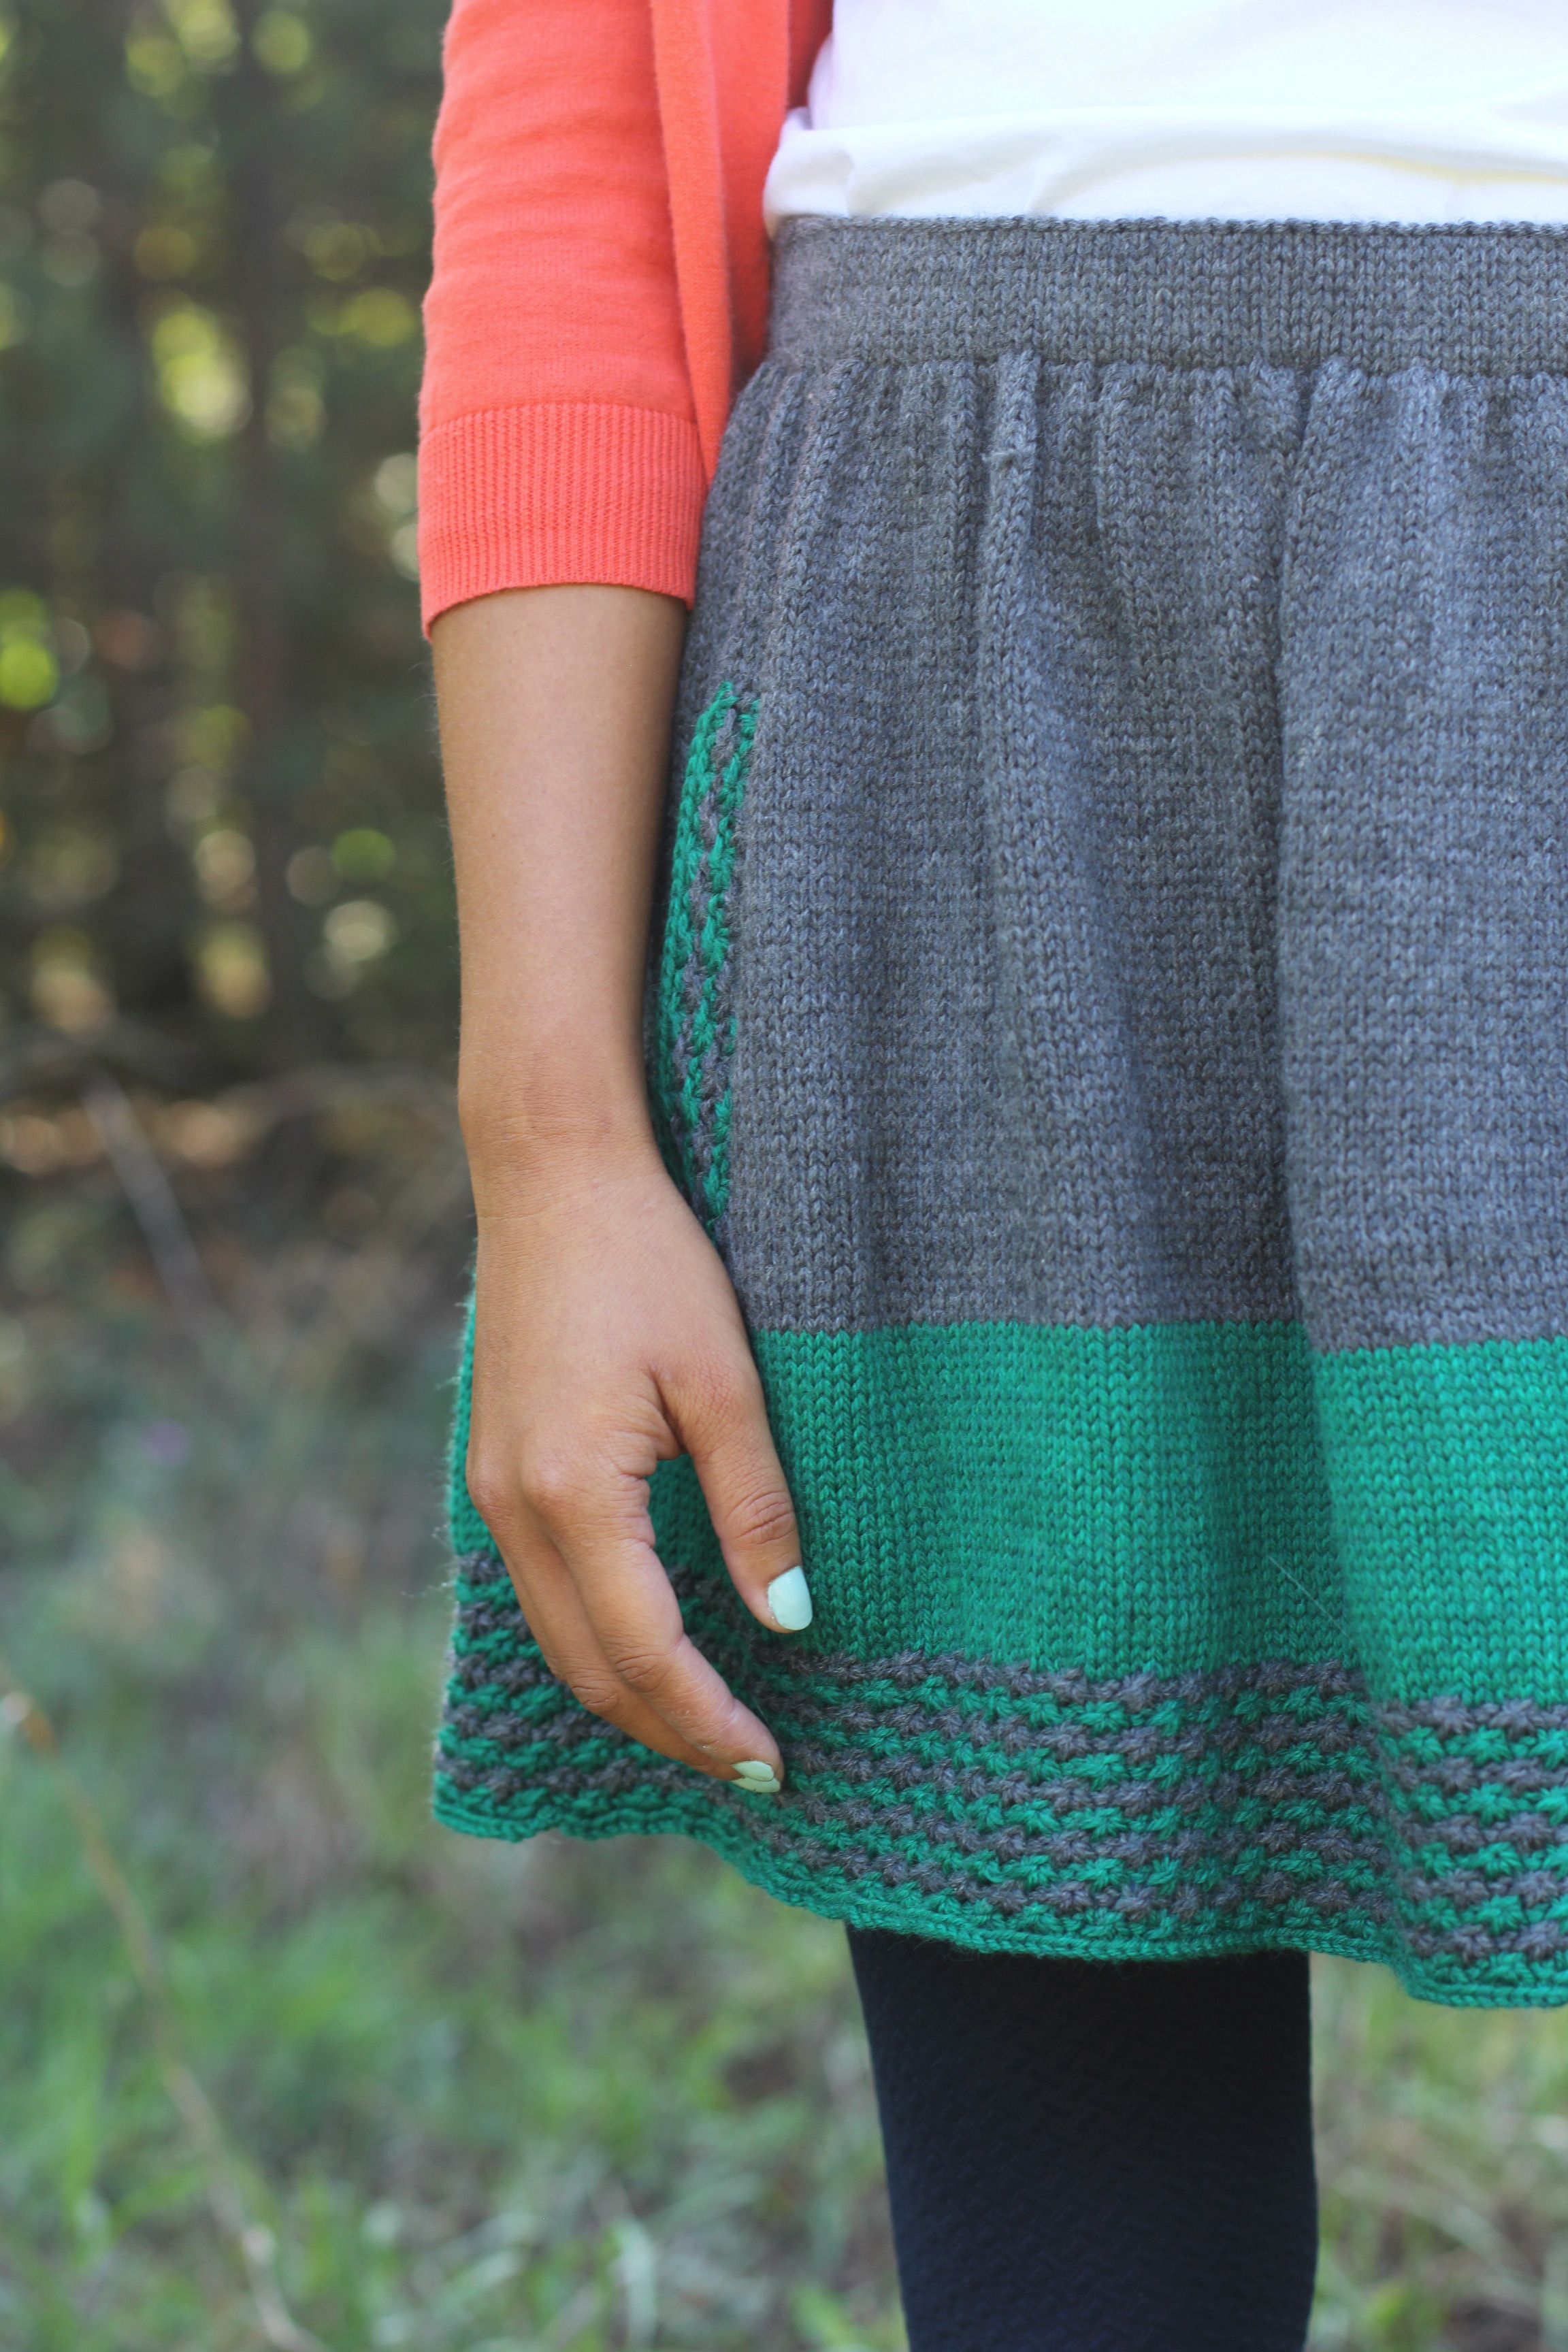 New Girl Knitting Pattern Allyson Dykhuizen Holla Knits Knit Picks ...